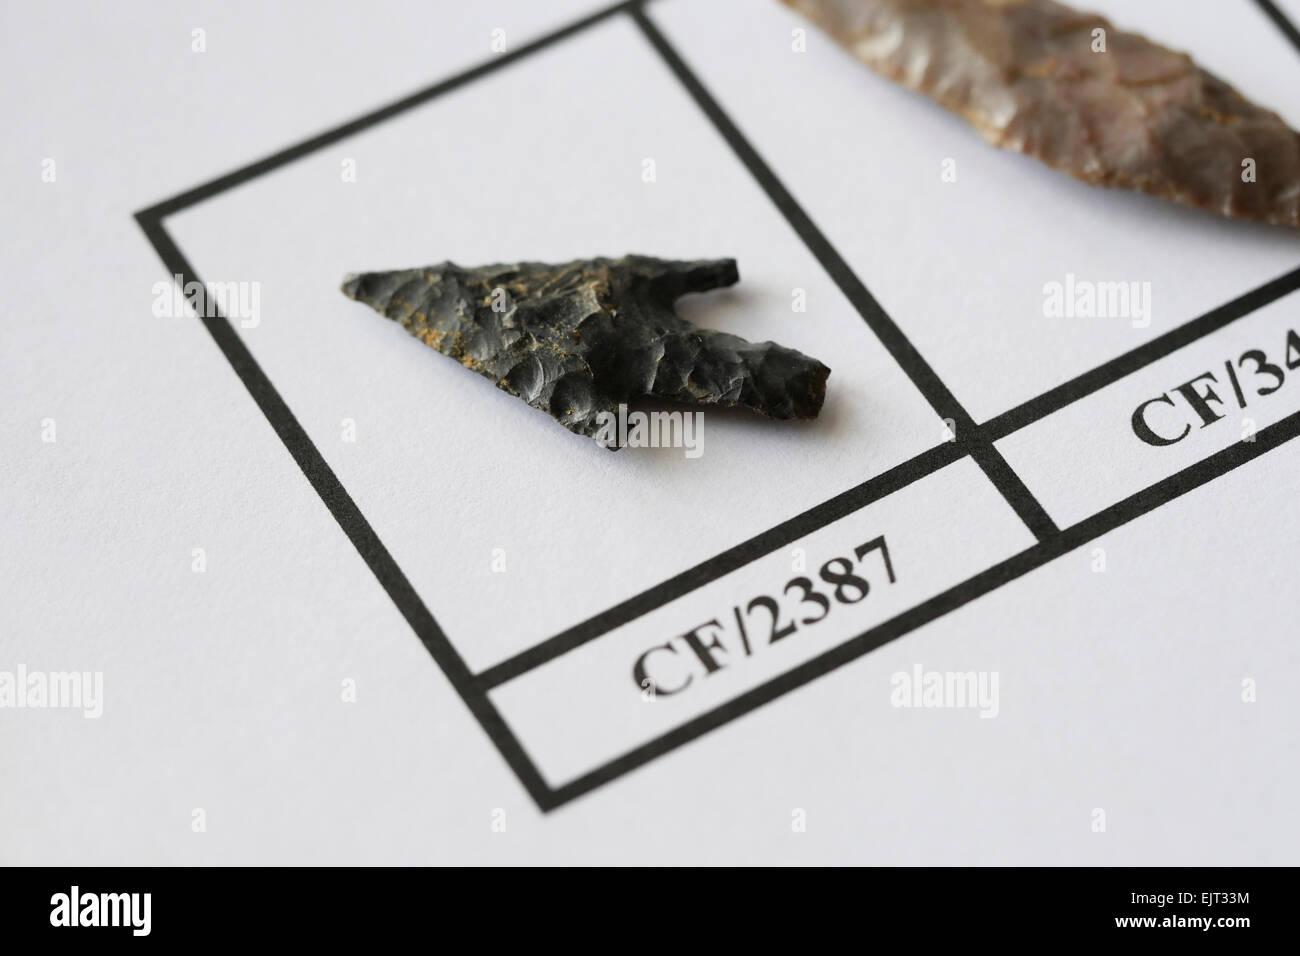 Neolithic flint arrowhead - Stock Image